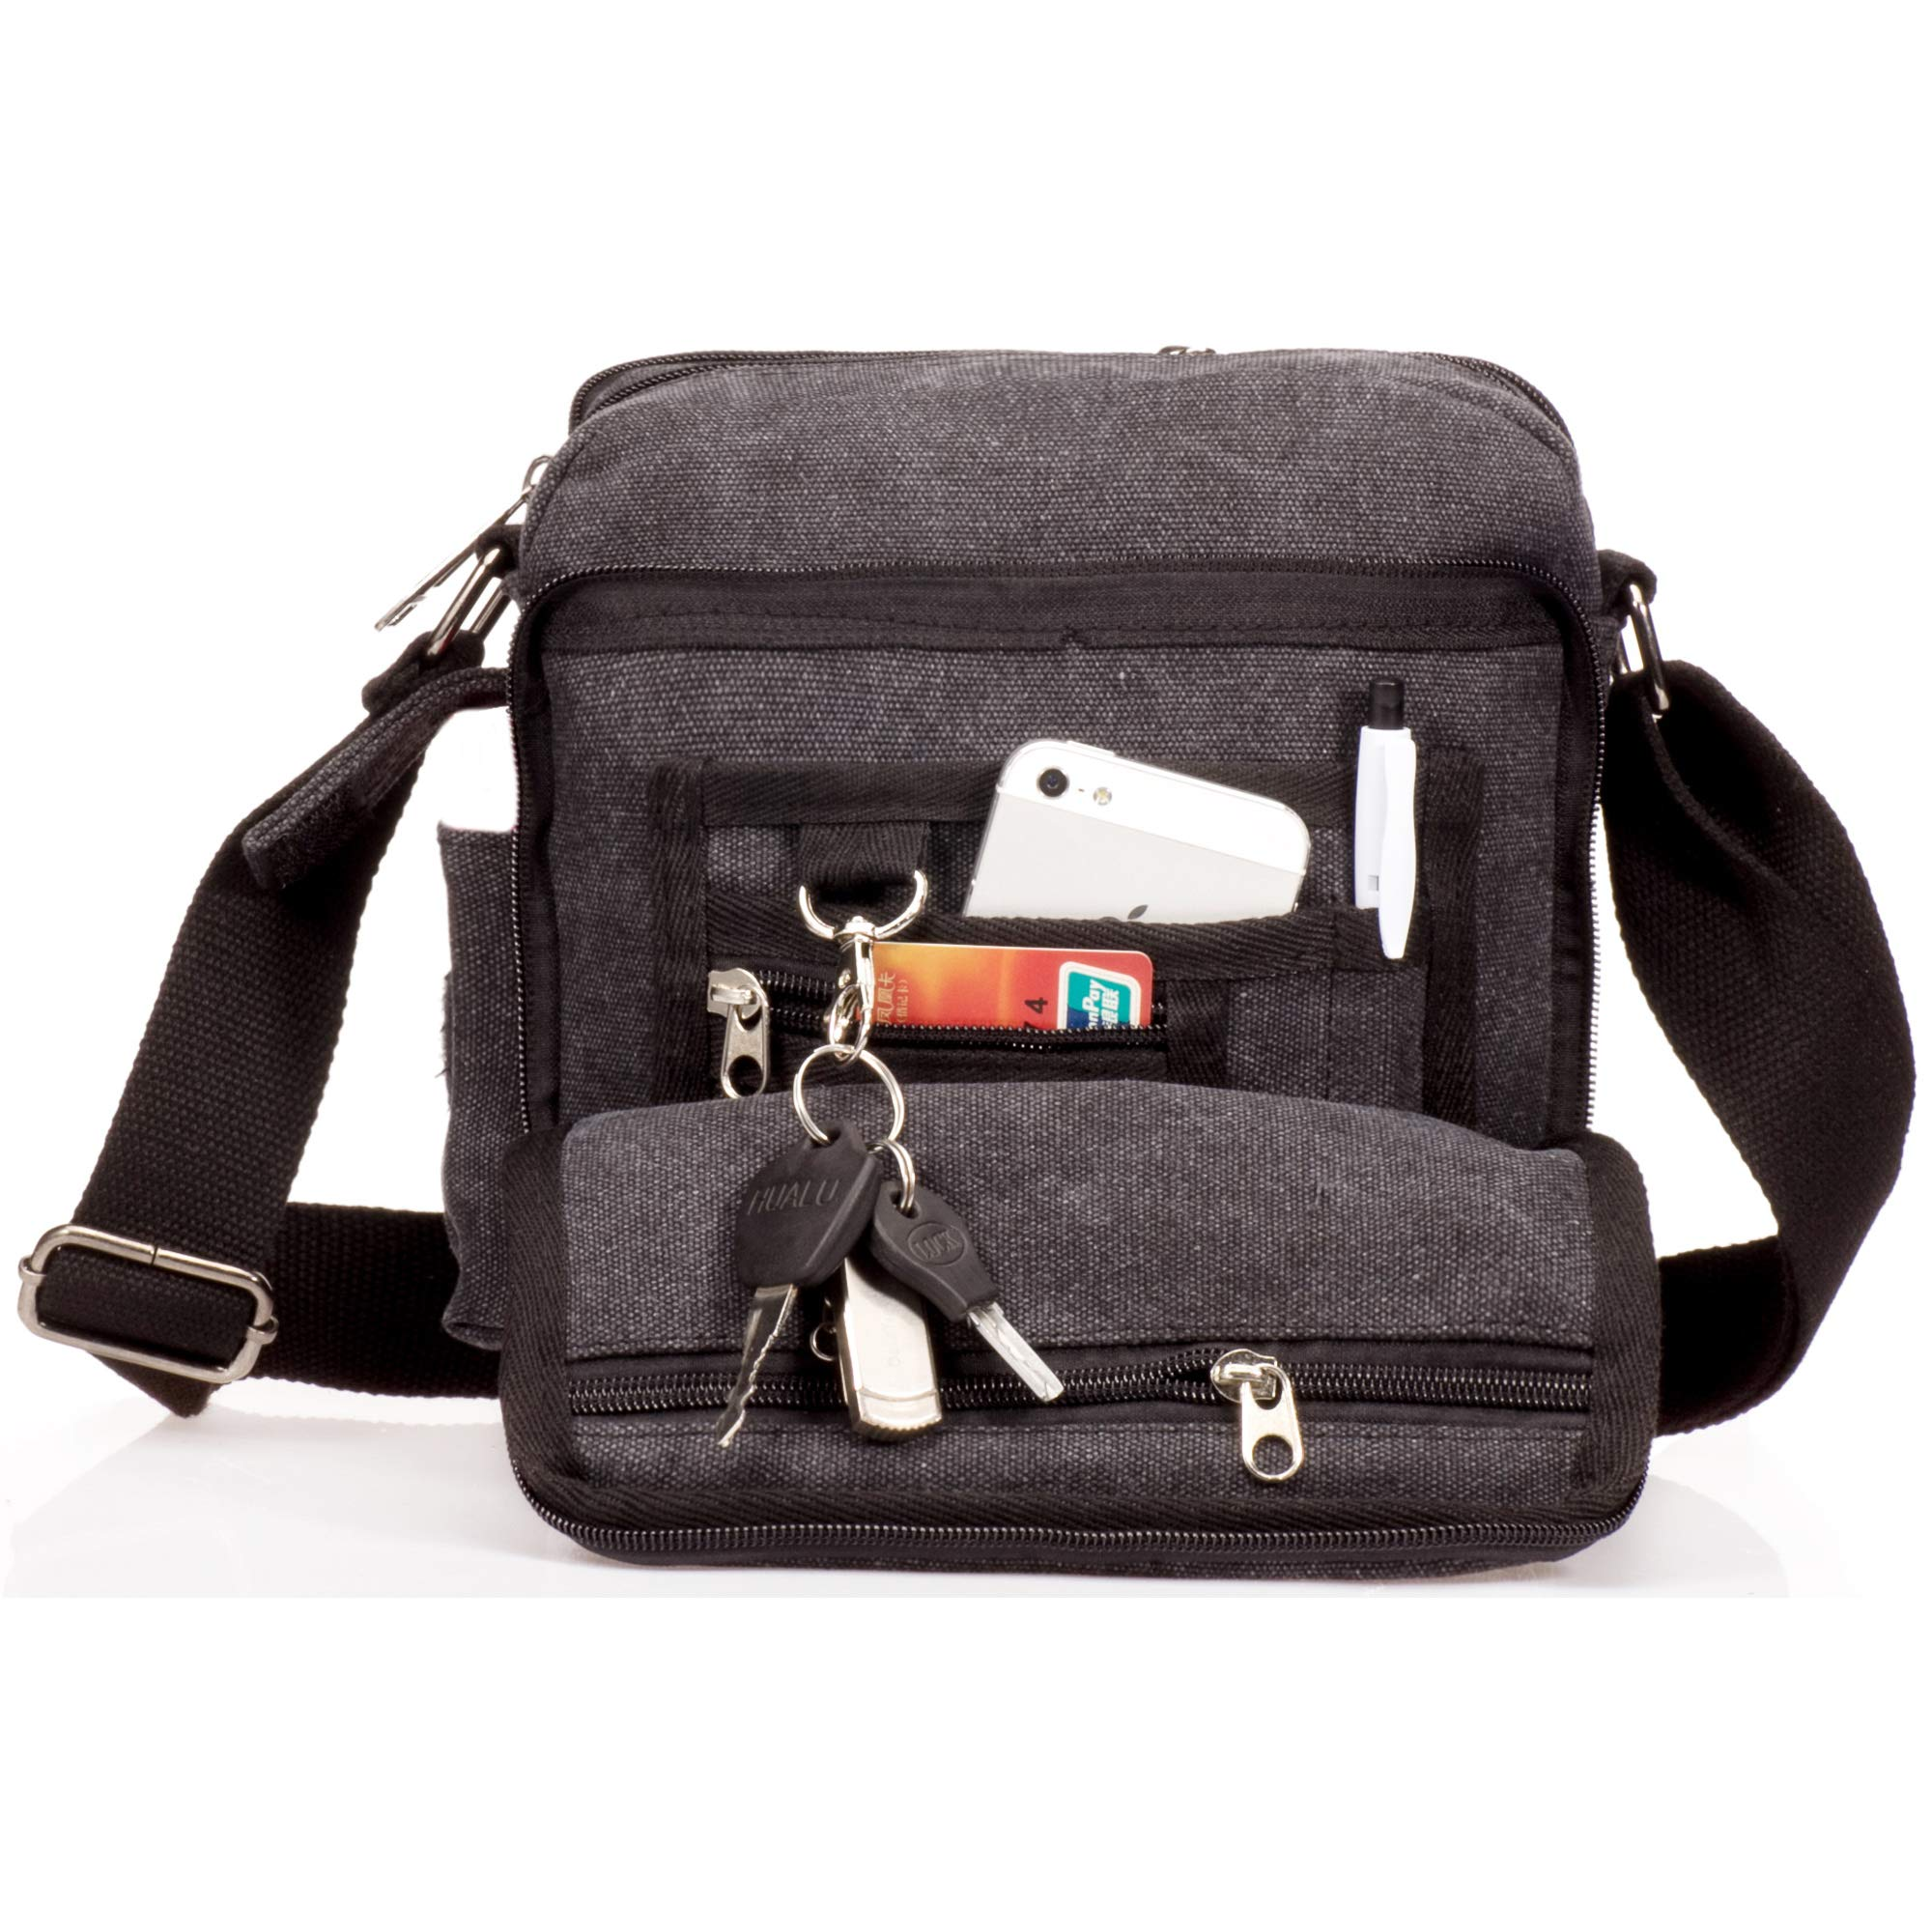 Outreo Bolso Bandolera Hombre Pequeñas Bolsos de Tela Vintage Messenger Bag para Colegio Bolsa de Lona